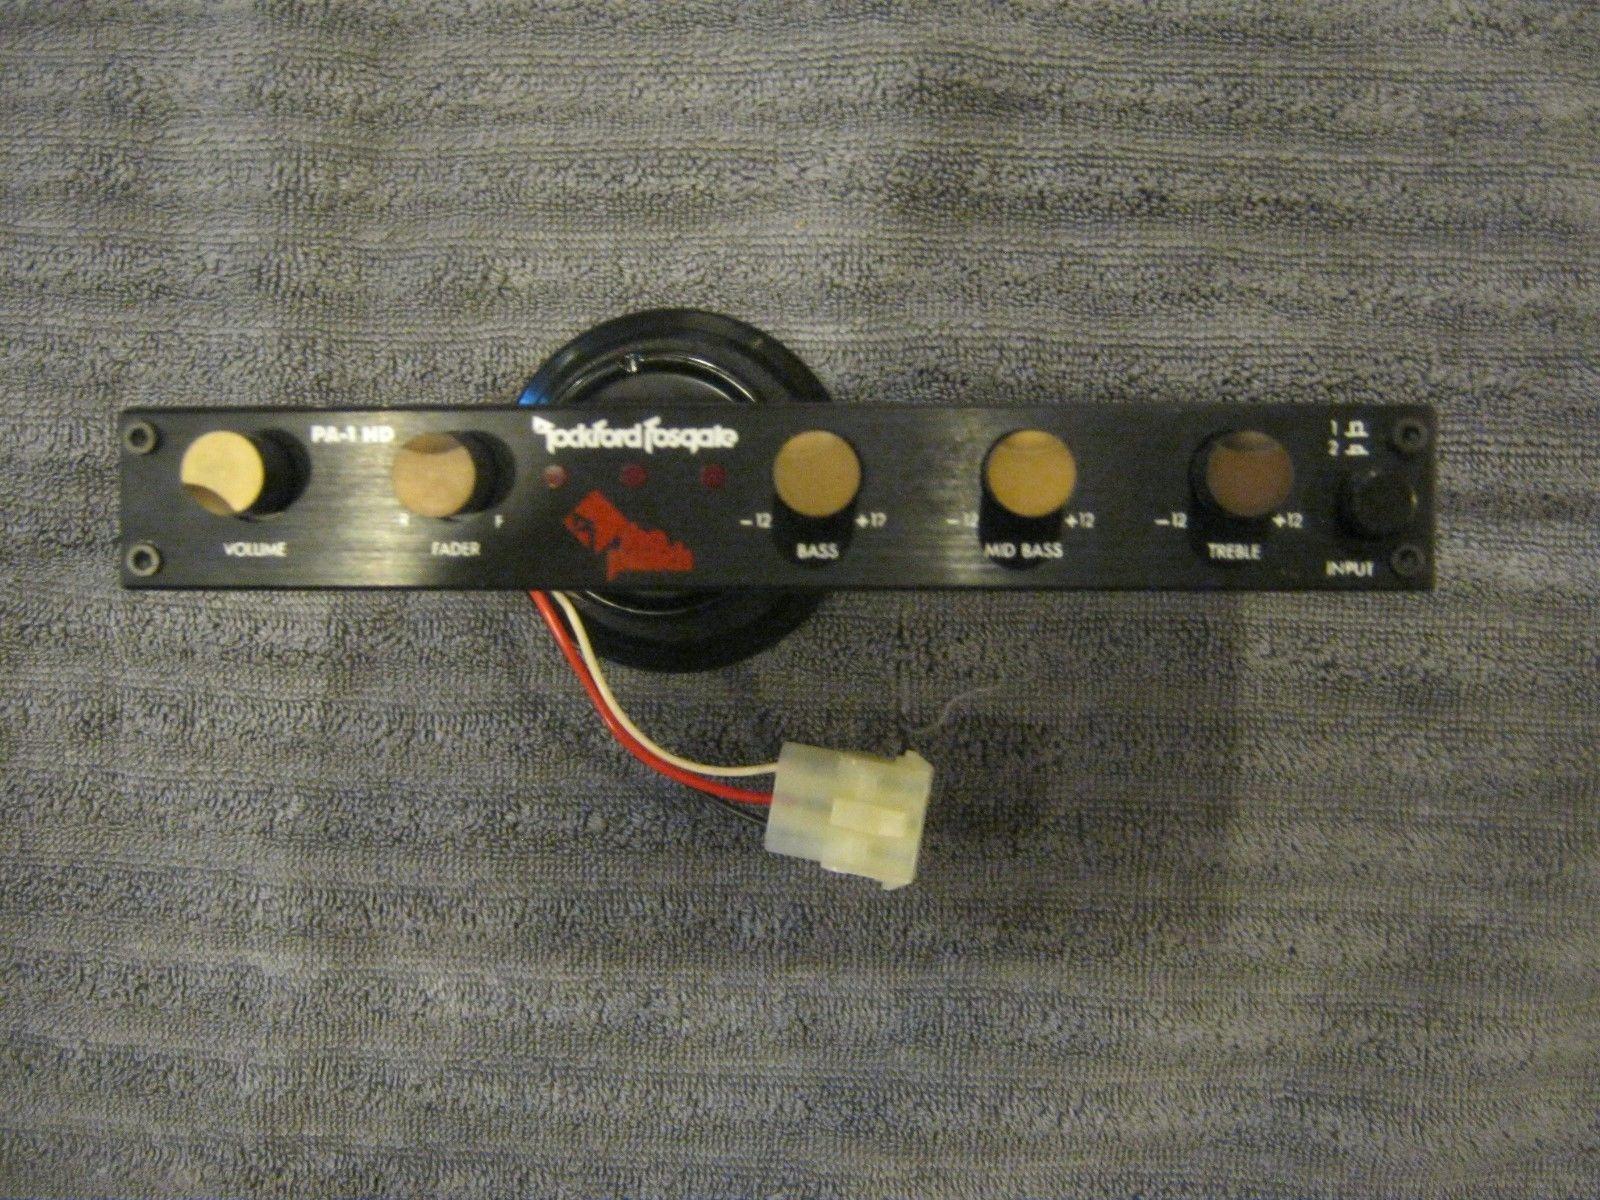 Amp Rockford Fosgate 650 Mos Fet Wiring Diagram - Wiring Diagrams ...